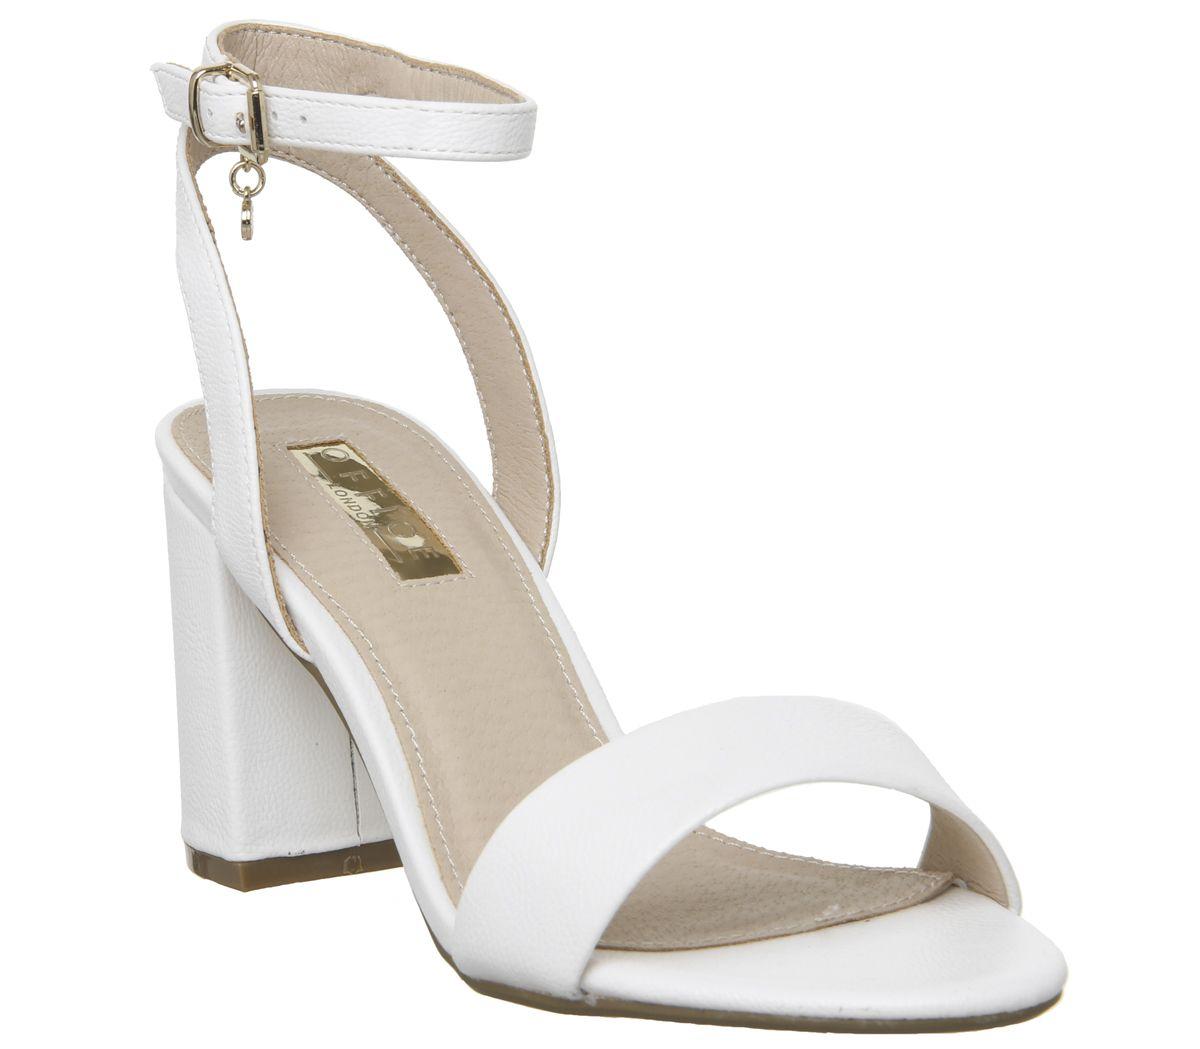 dd6492501 Office Marigold Strappy Heels White Pu - Mid Heels